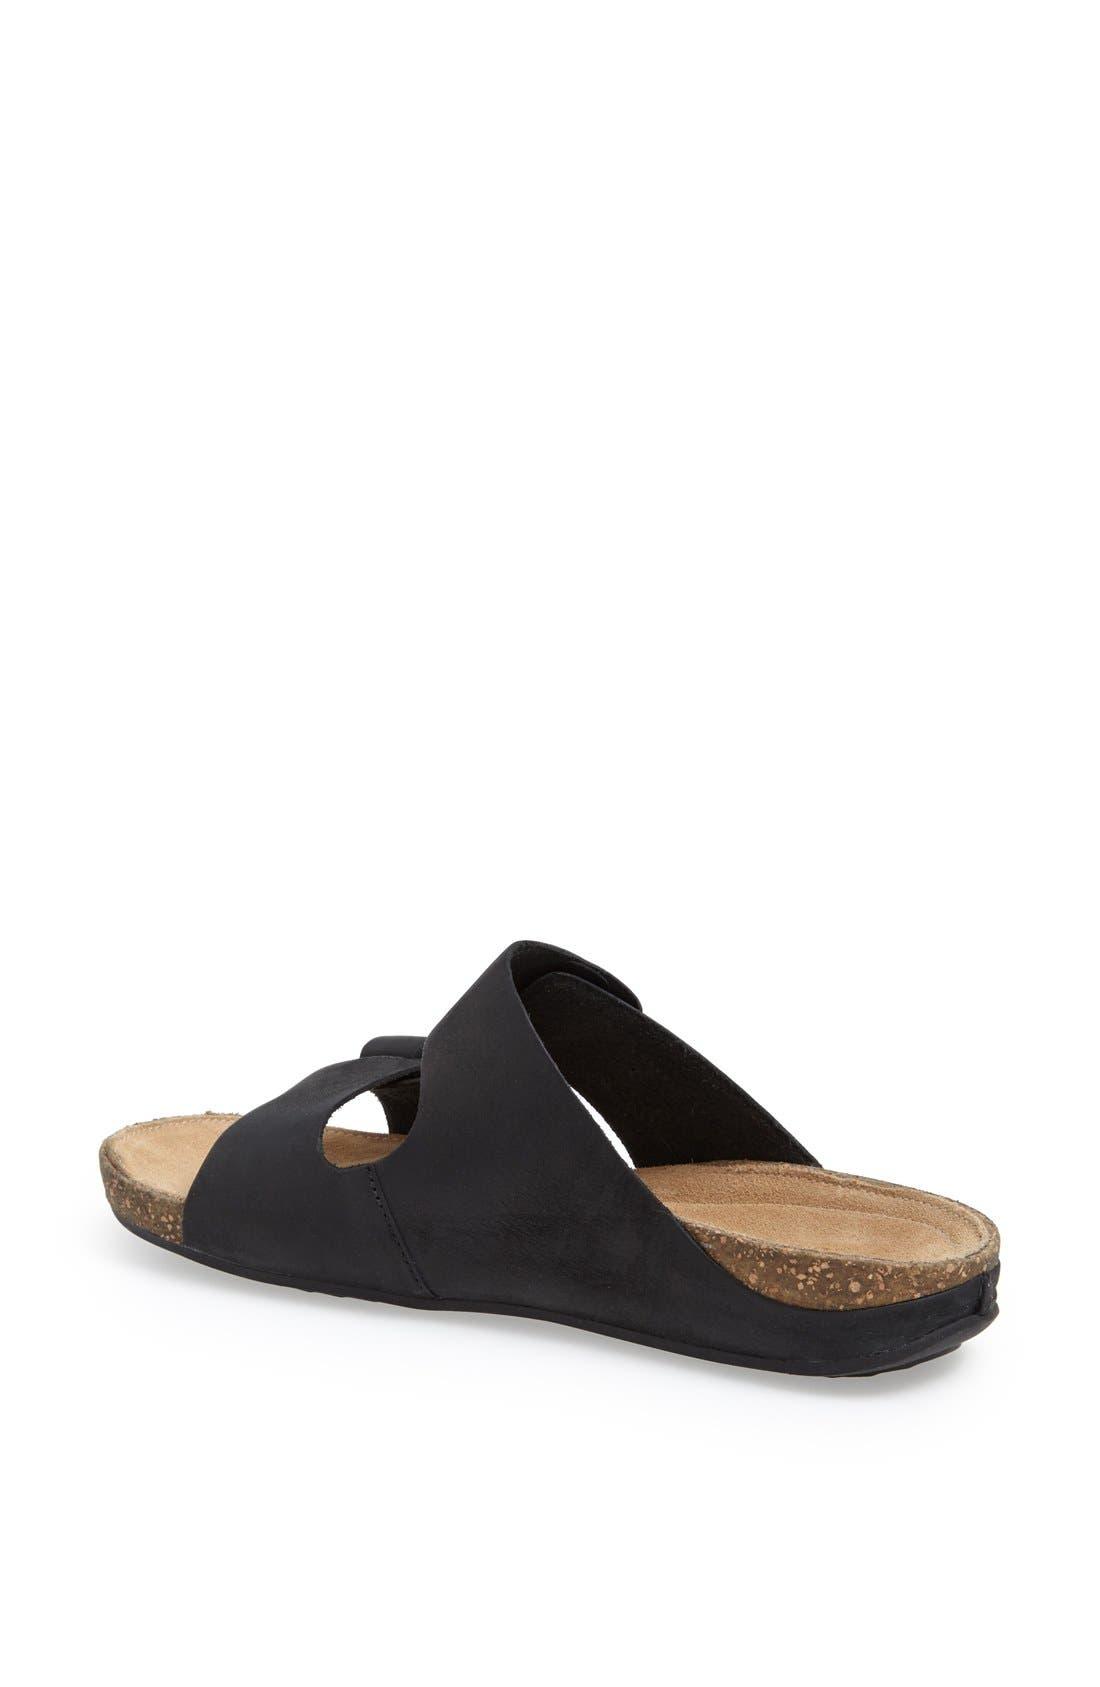 'Perri Coast' Leather Thong Sandal,                             Alternate thumbnail 2, color,                             005